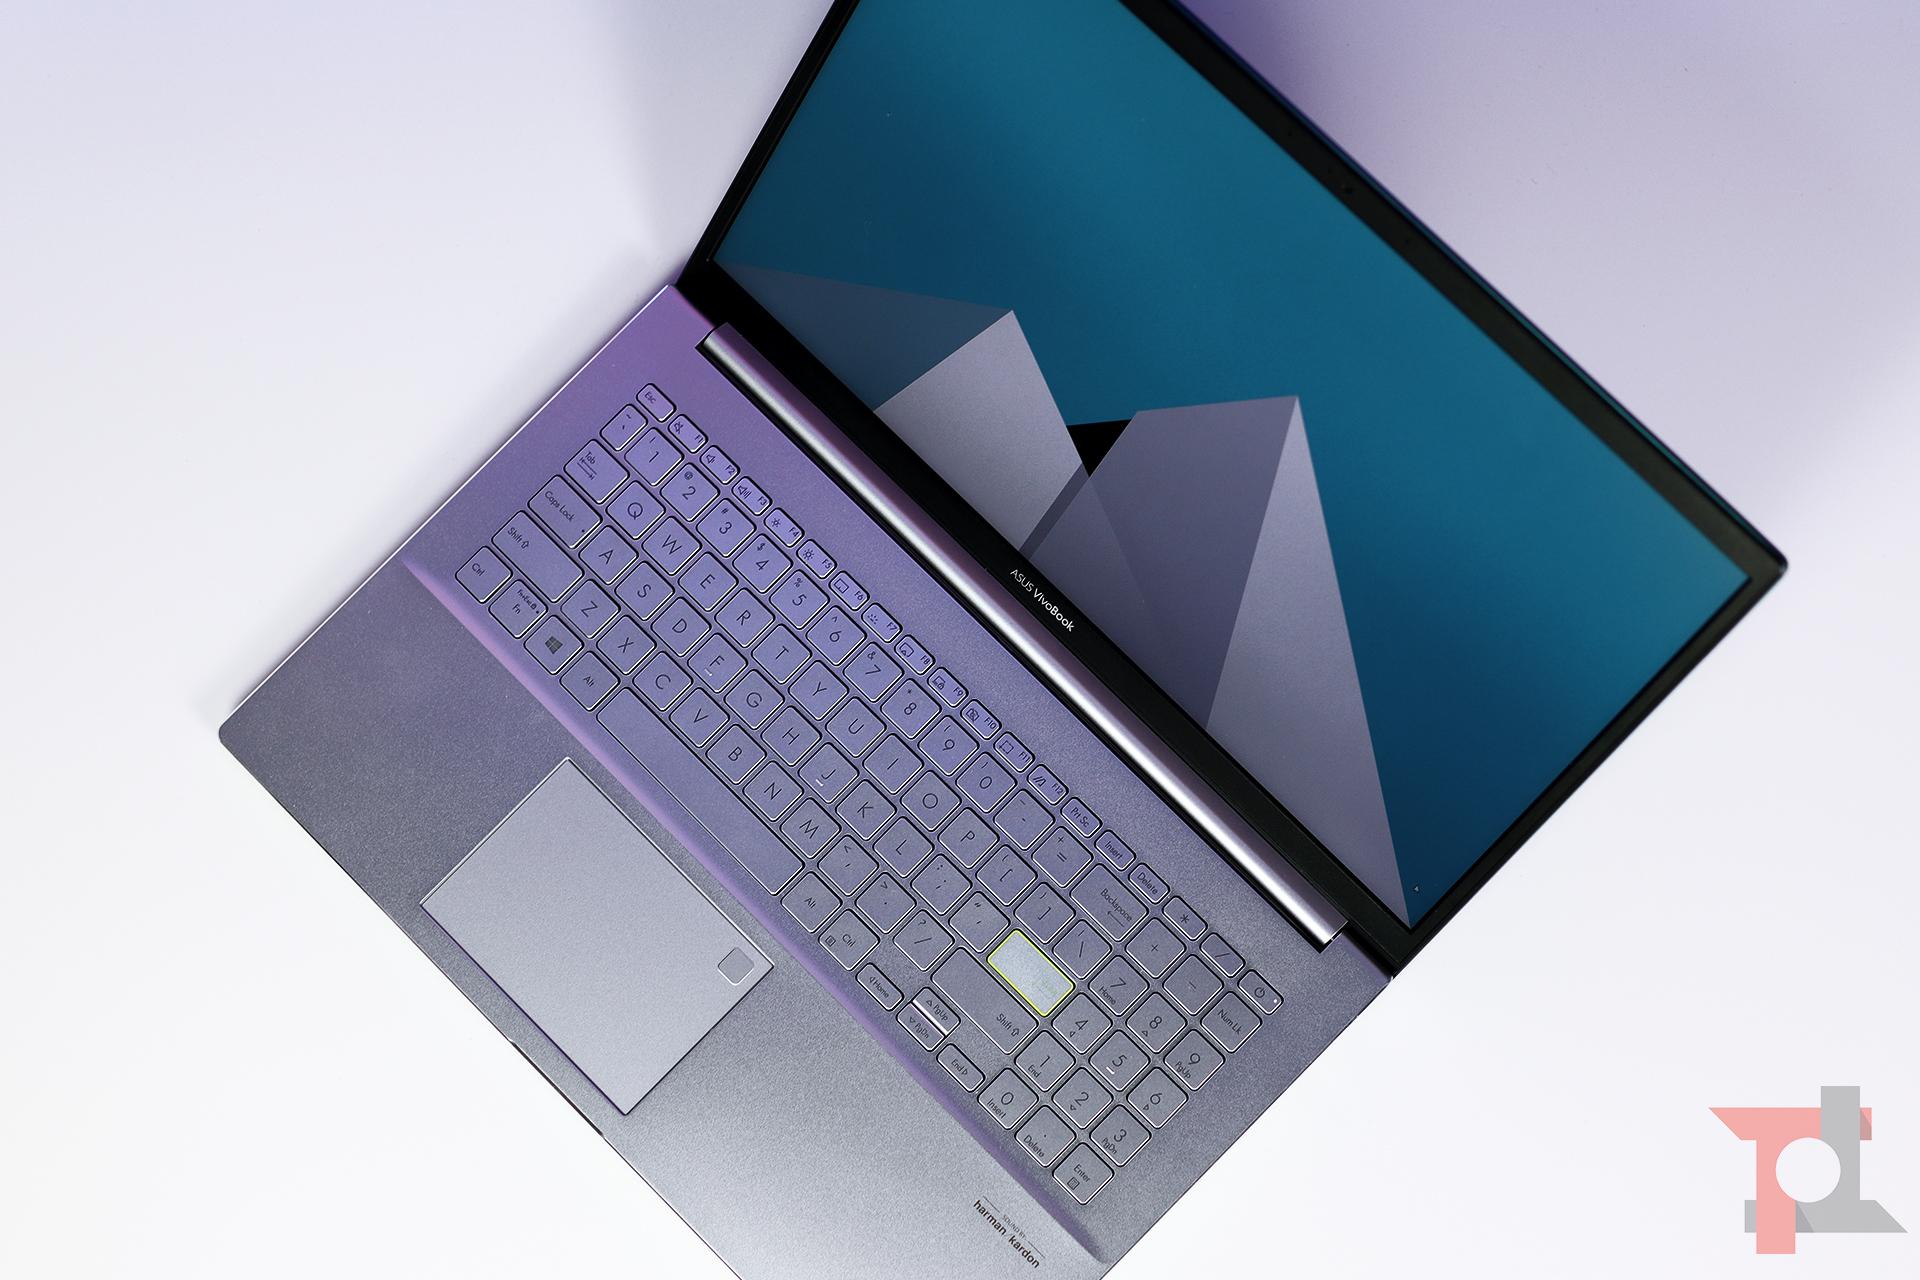 Asus Vivobook s5333